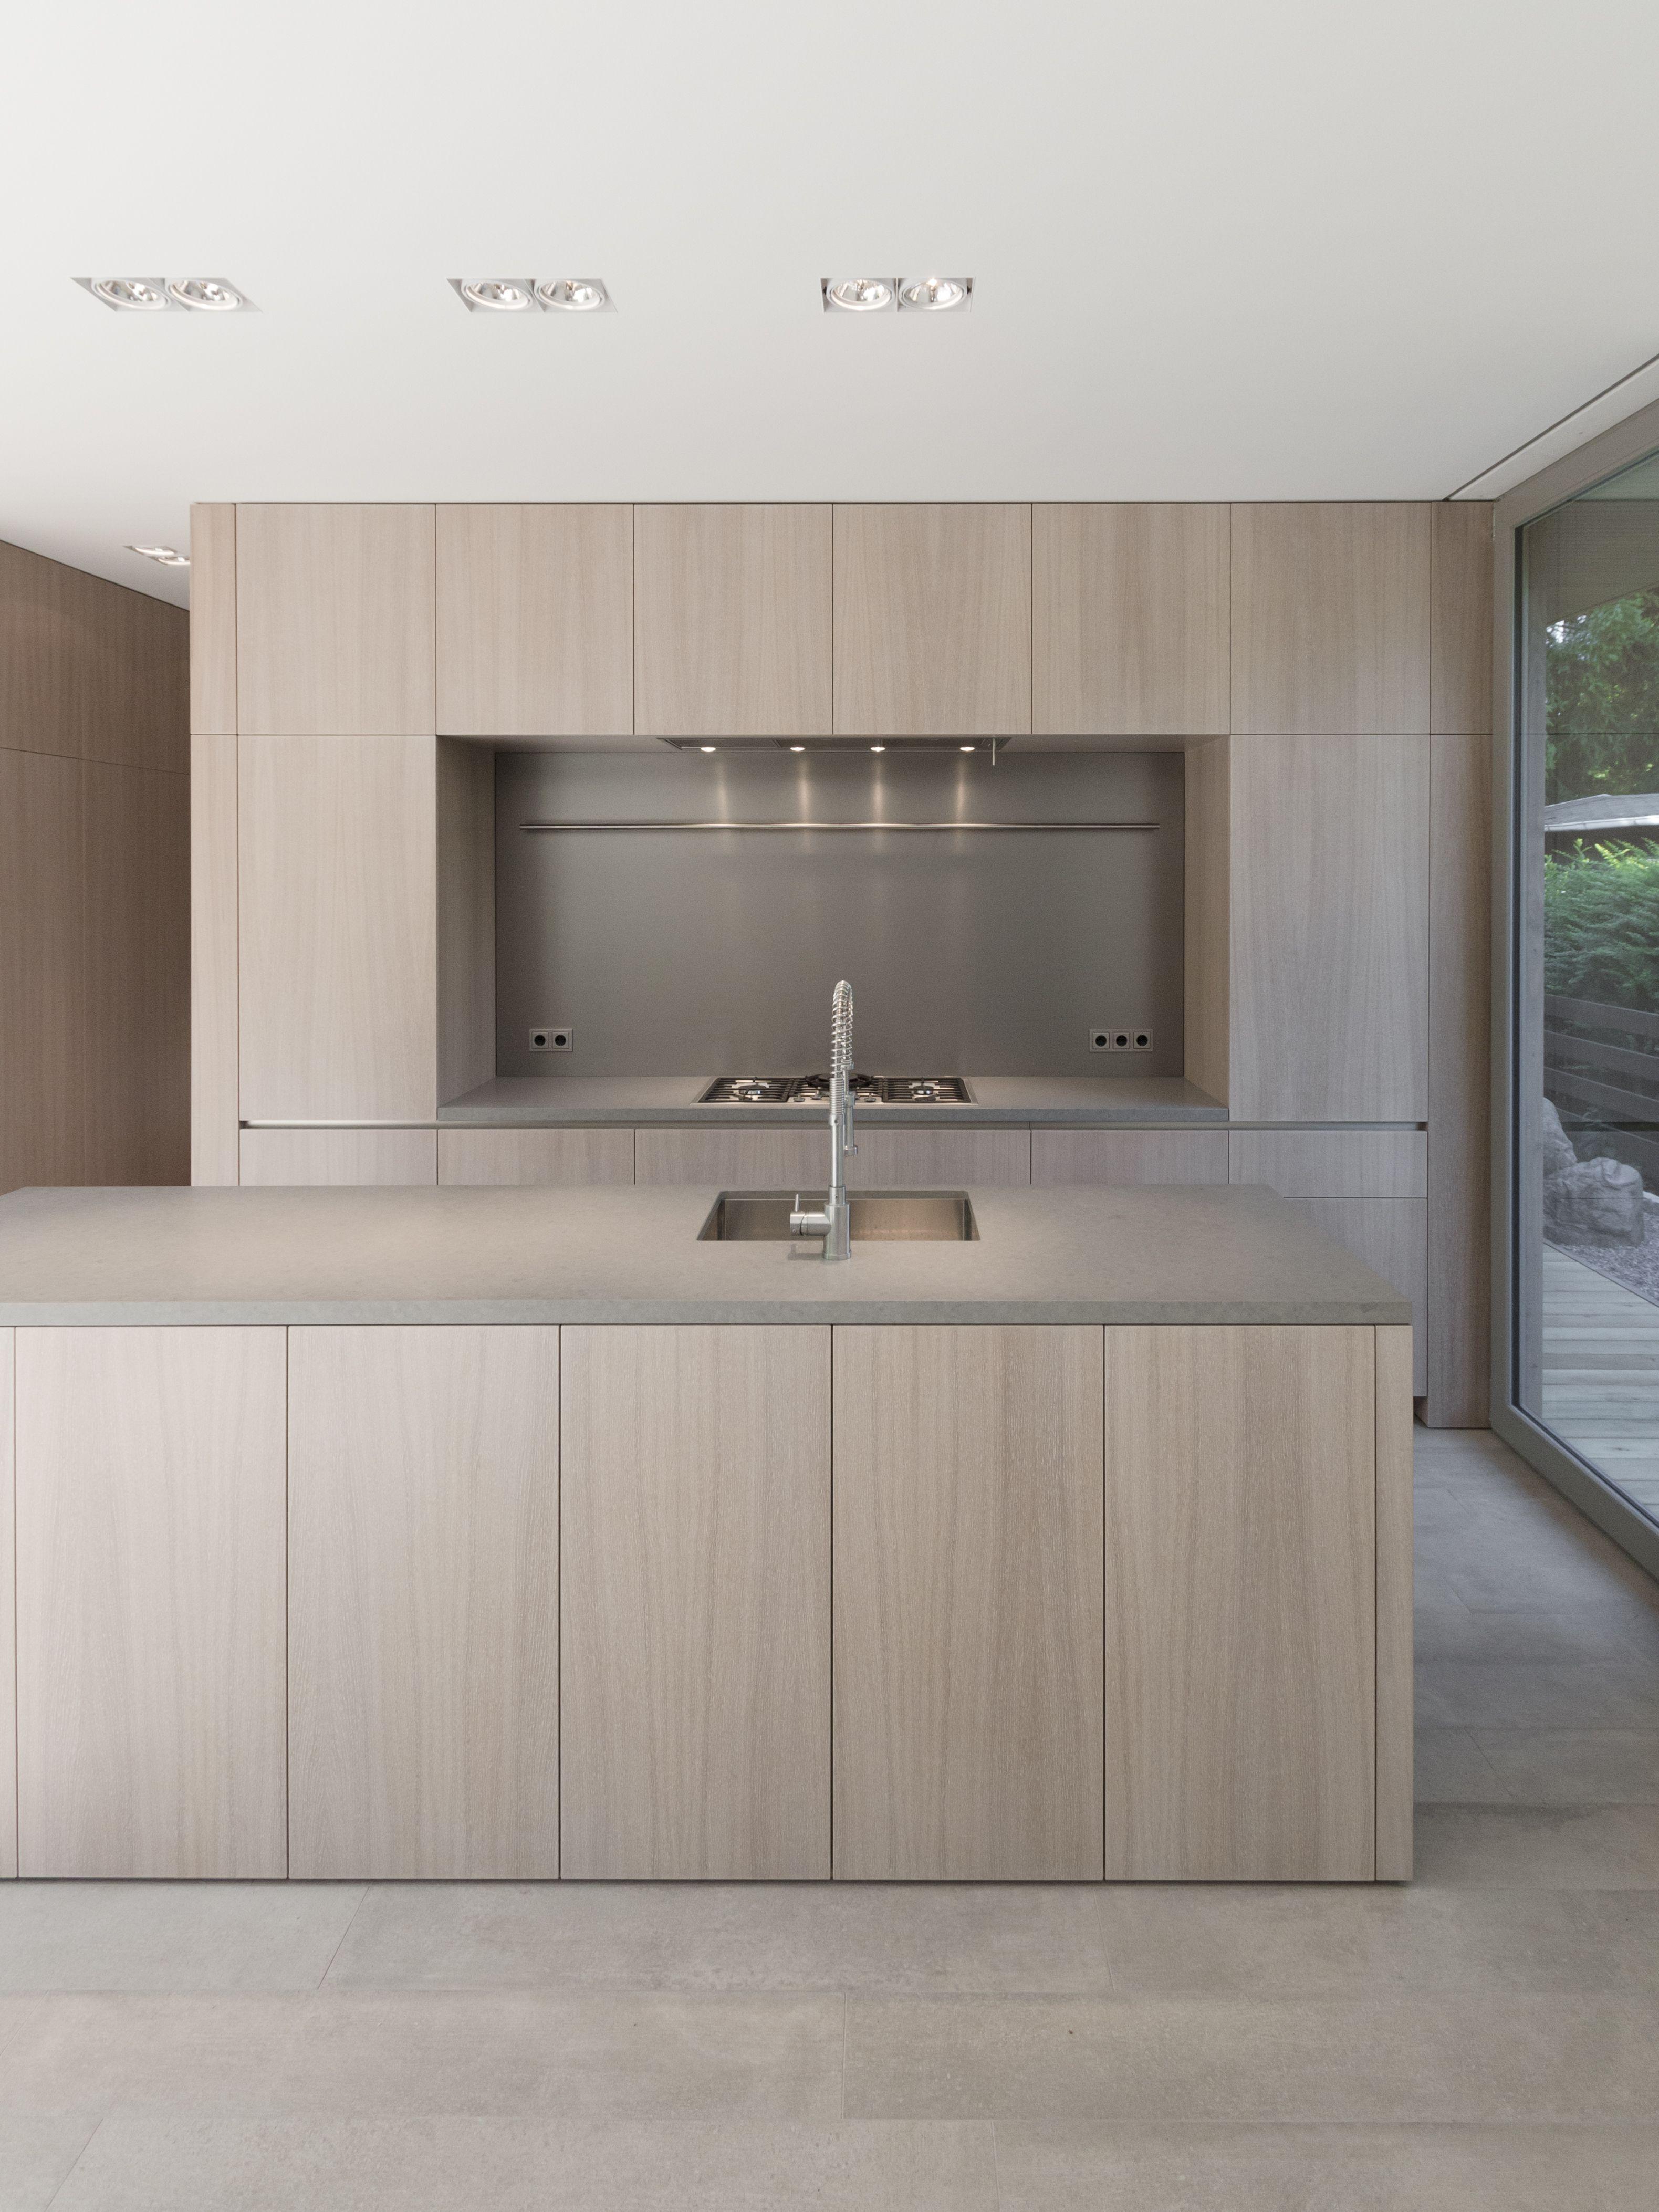 Moderne Kuche Mit Holzboden Kuche Holz Beton